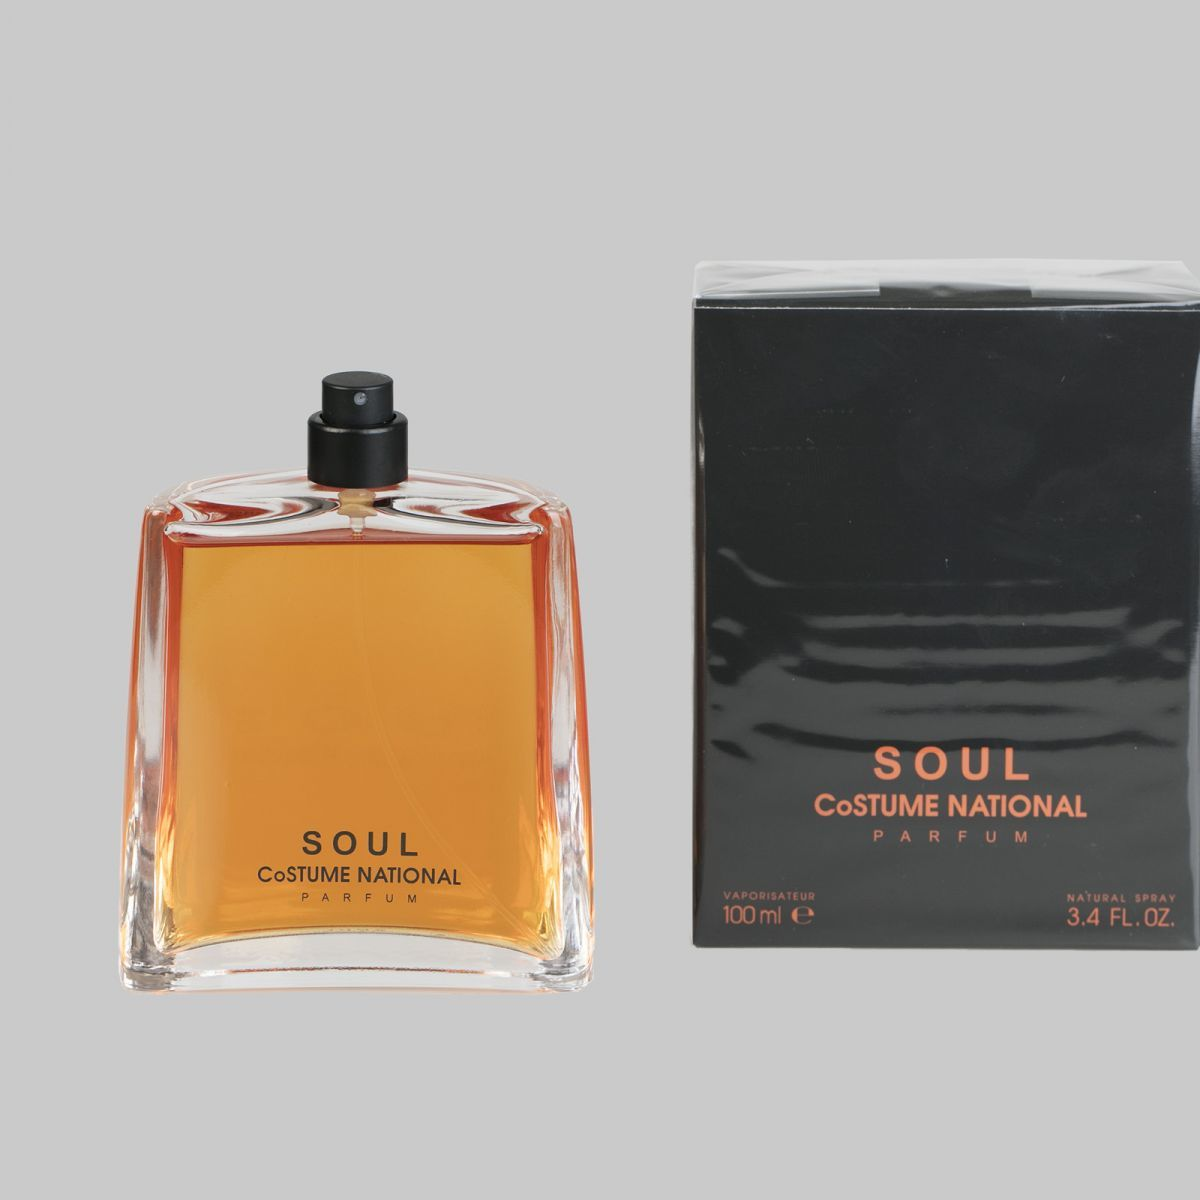 Costume national コスチュームナショナル ソウルパルファム Soul Parfum 100ml